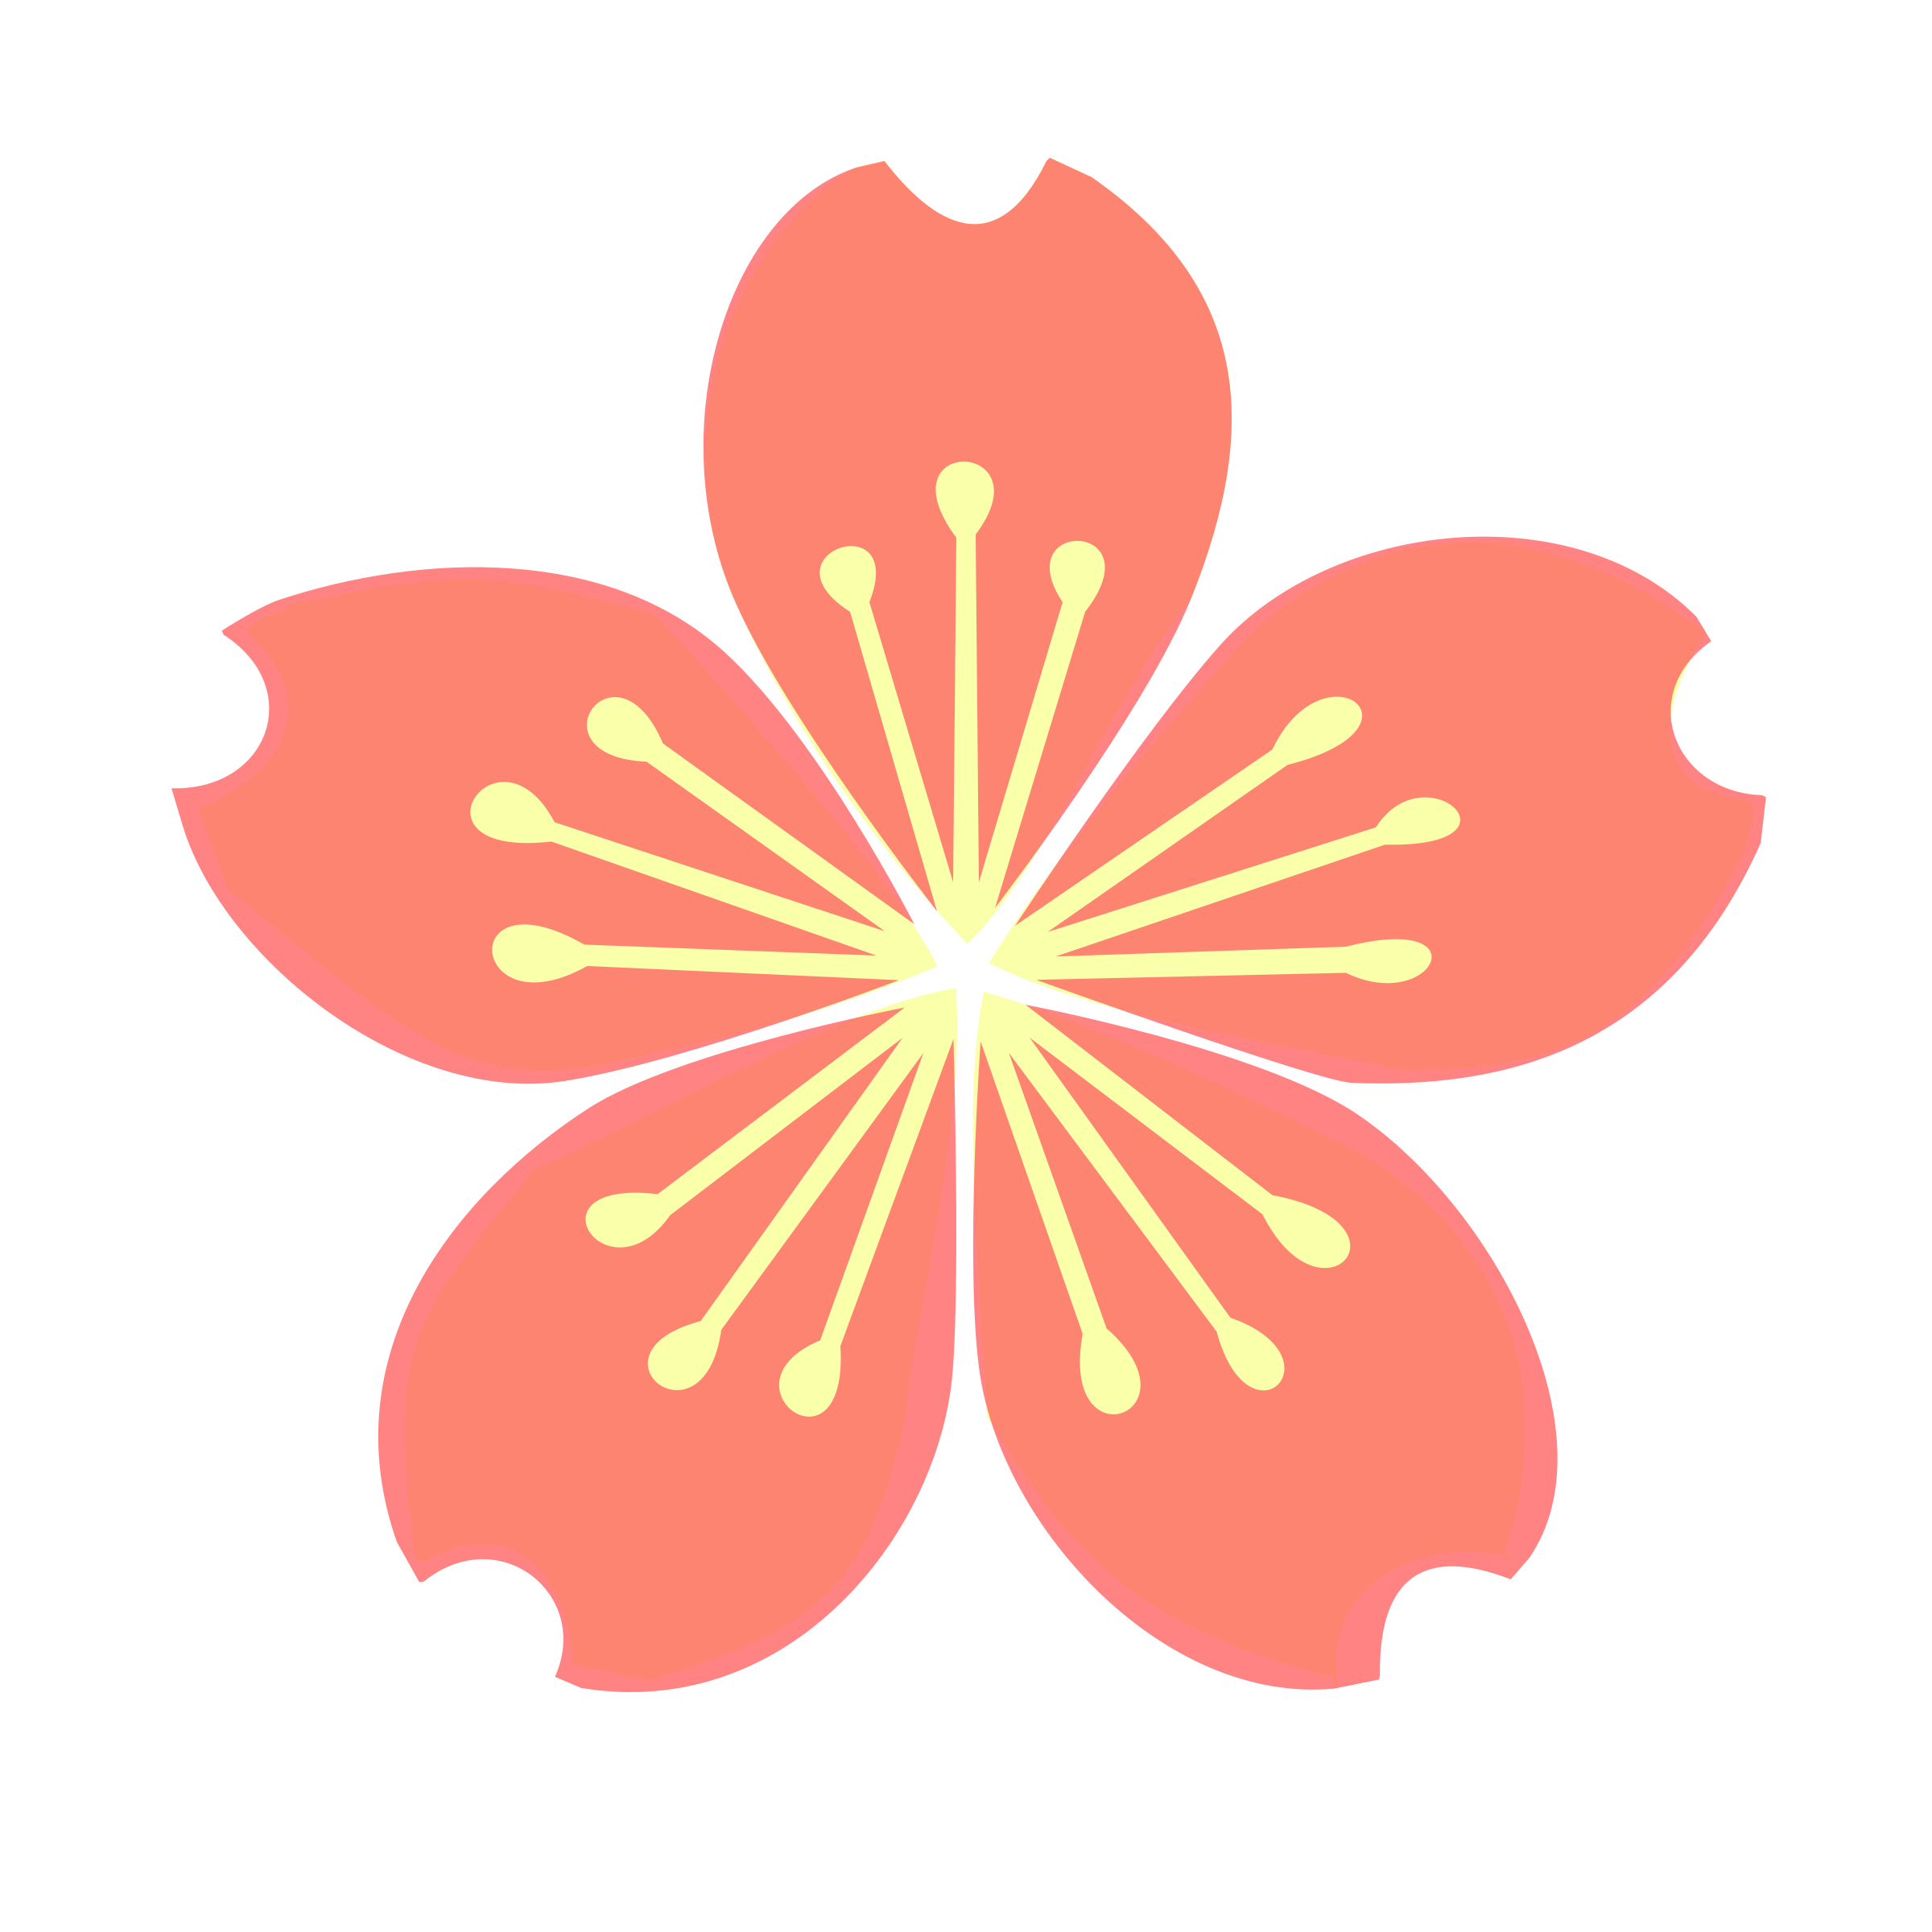 Cherry blossom flower clipart free Clipart - Cherry blossom-loading spinner free